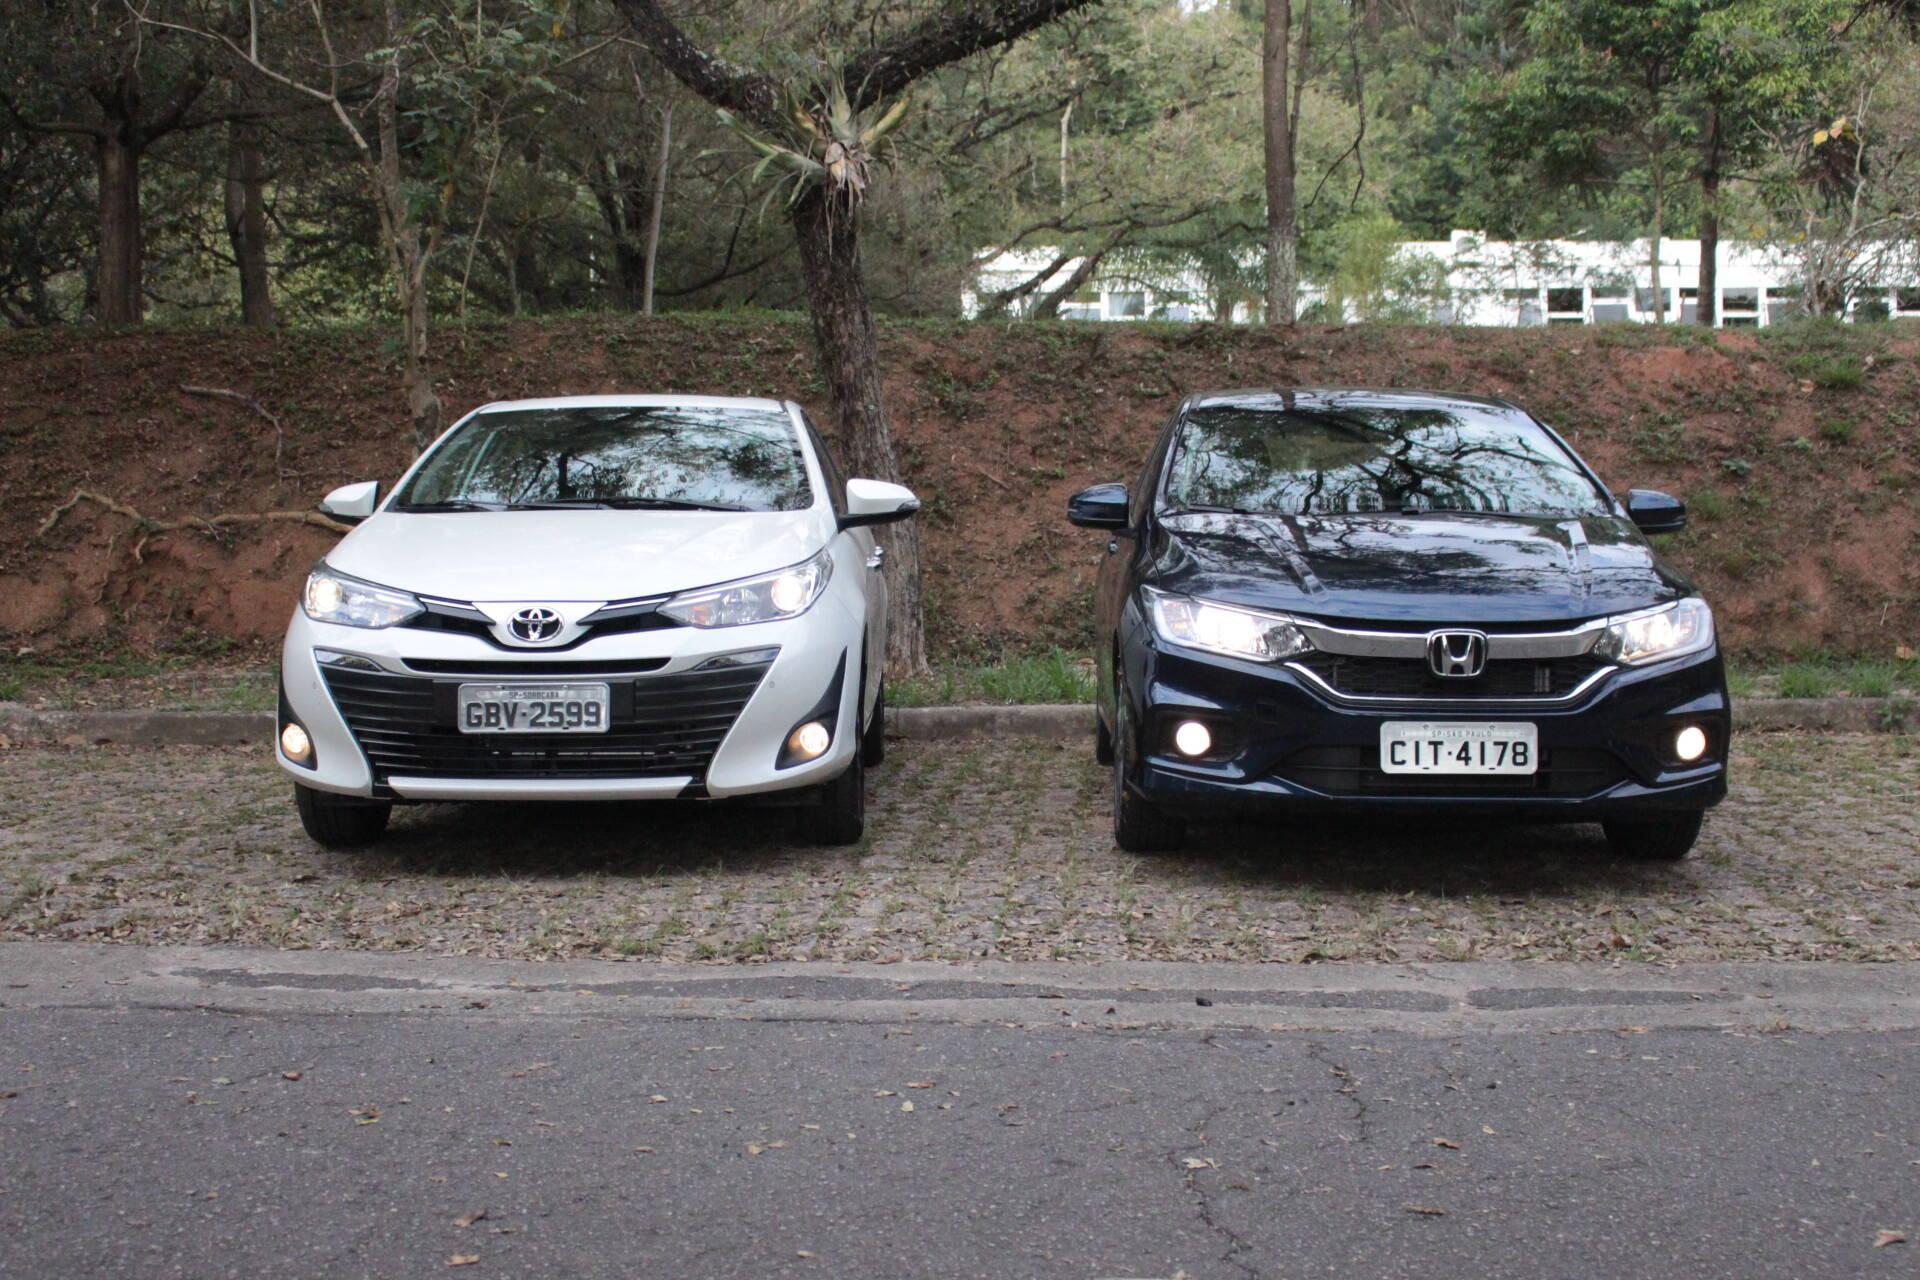 Toyota Yaris x Honda City. Foto: Cauê Lira/iG Carros